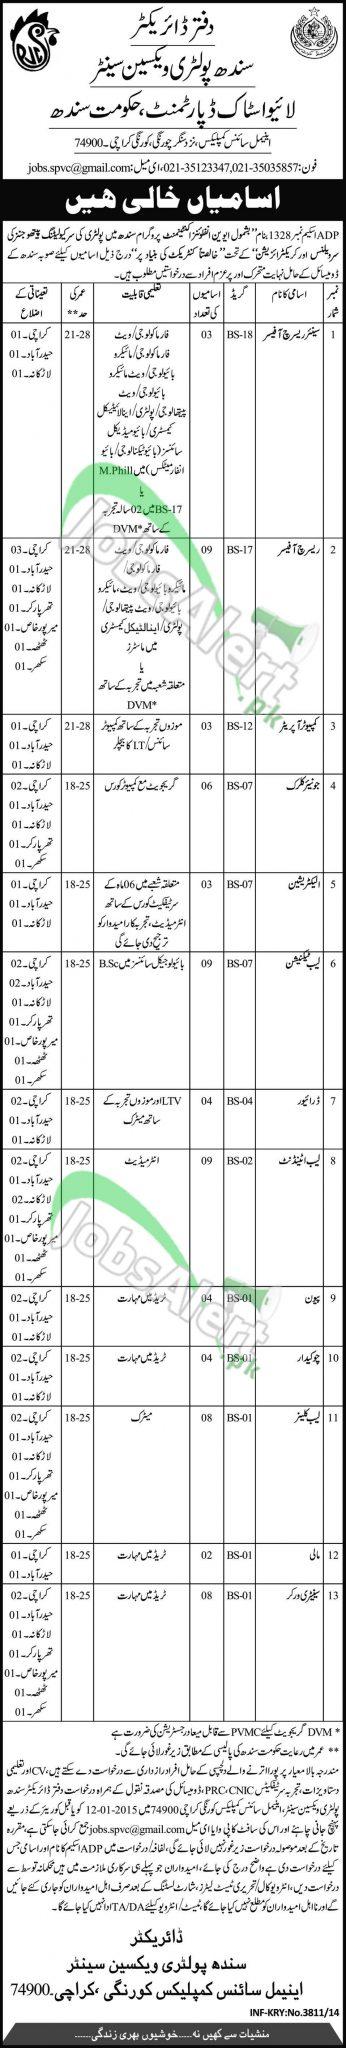 Livestock Department Sindh